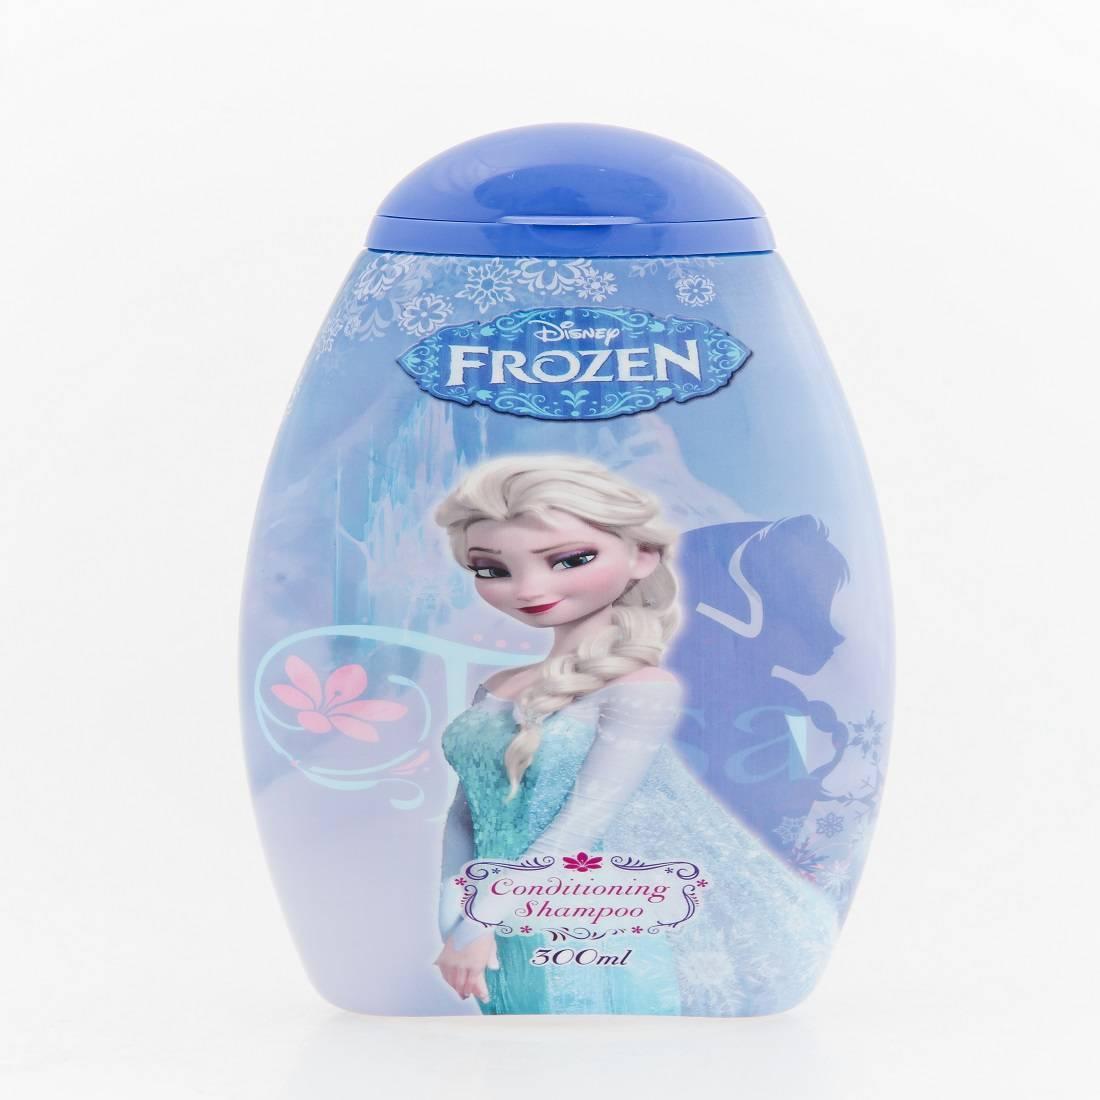 Disney Frozen Elsa Baby Shampoo